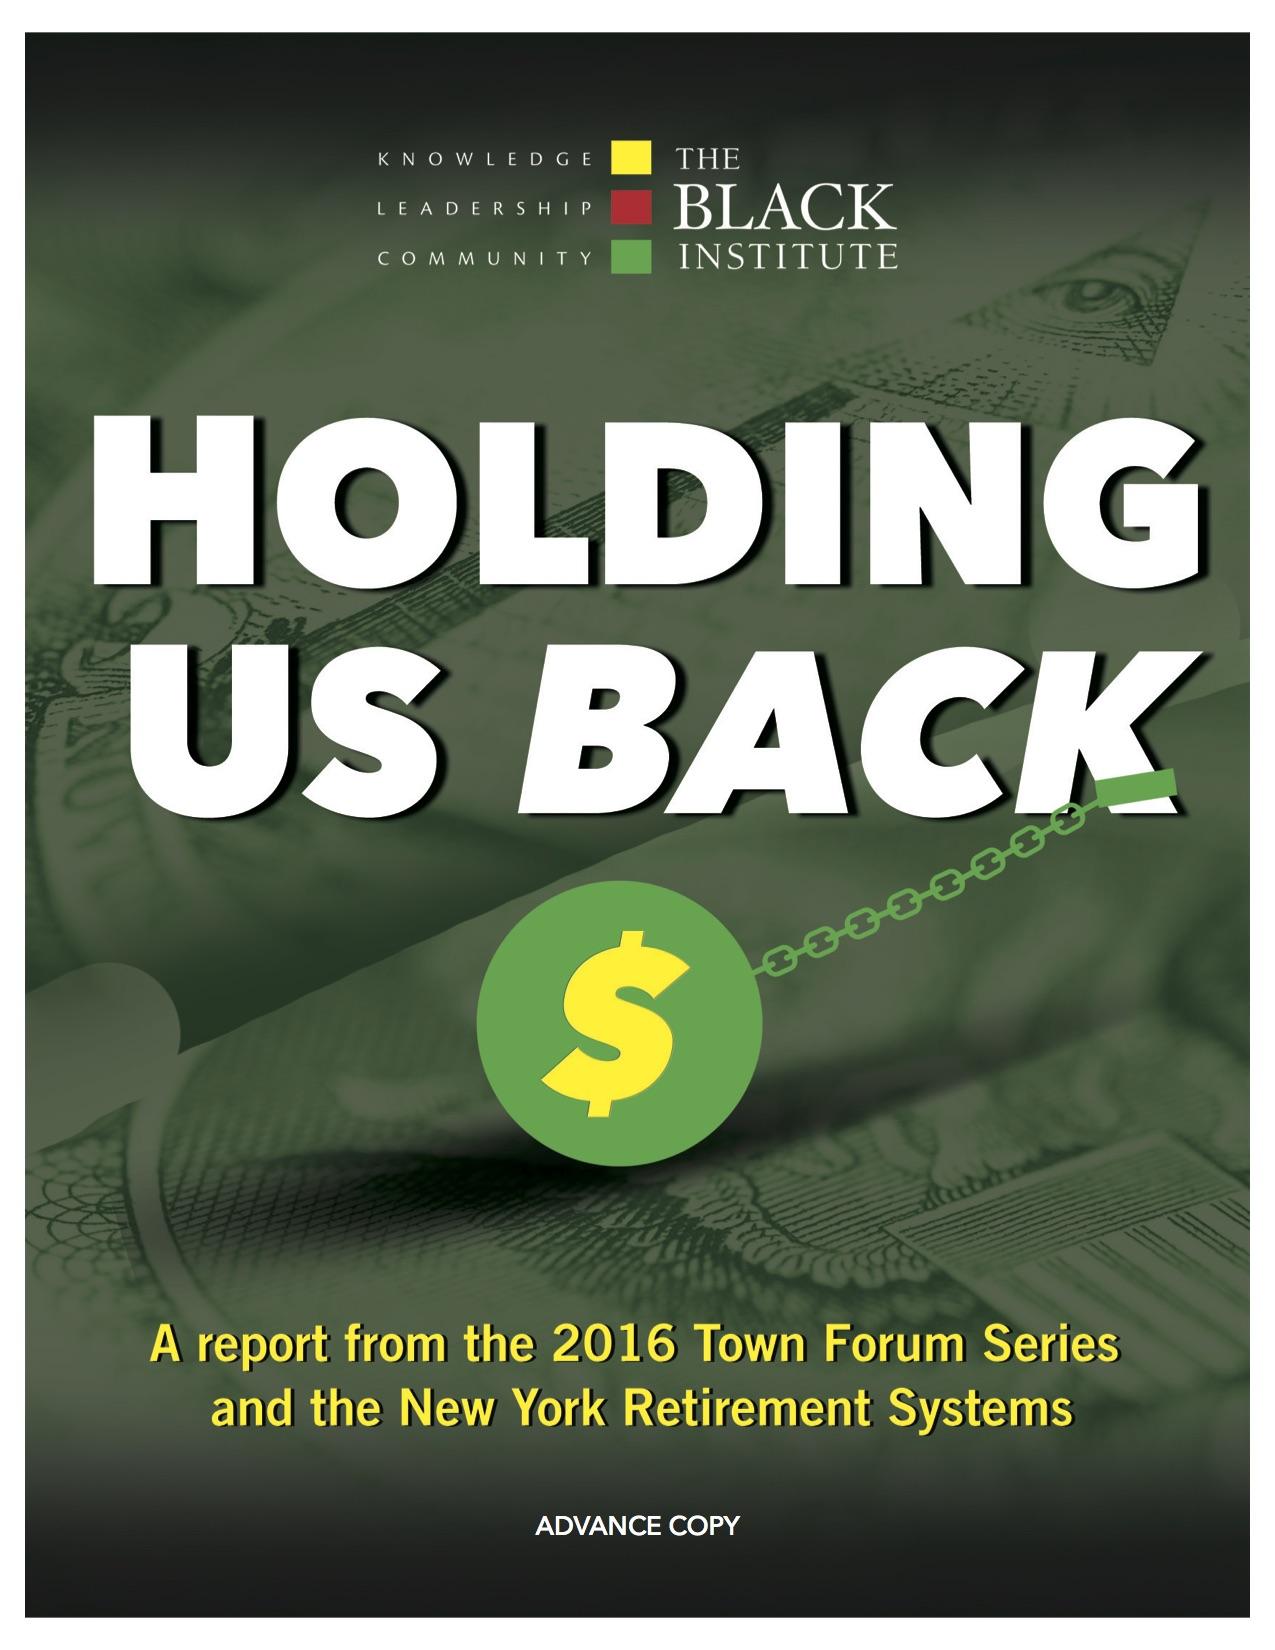 TBI_HoldingUsBack_Report_Cover.jpg